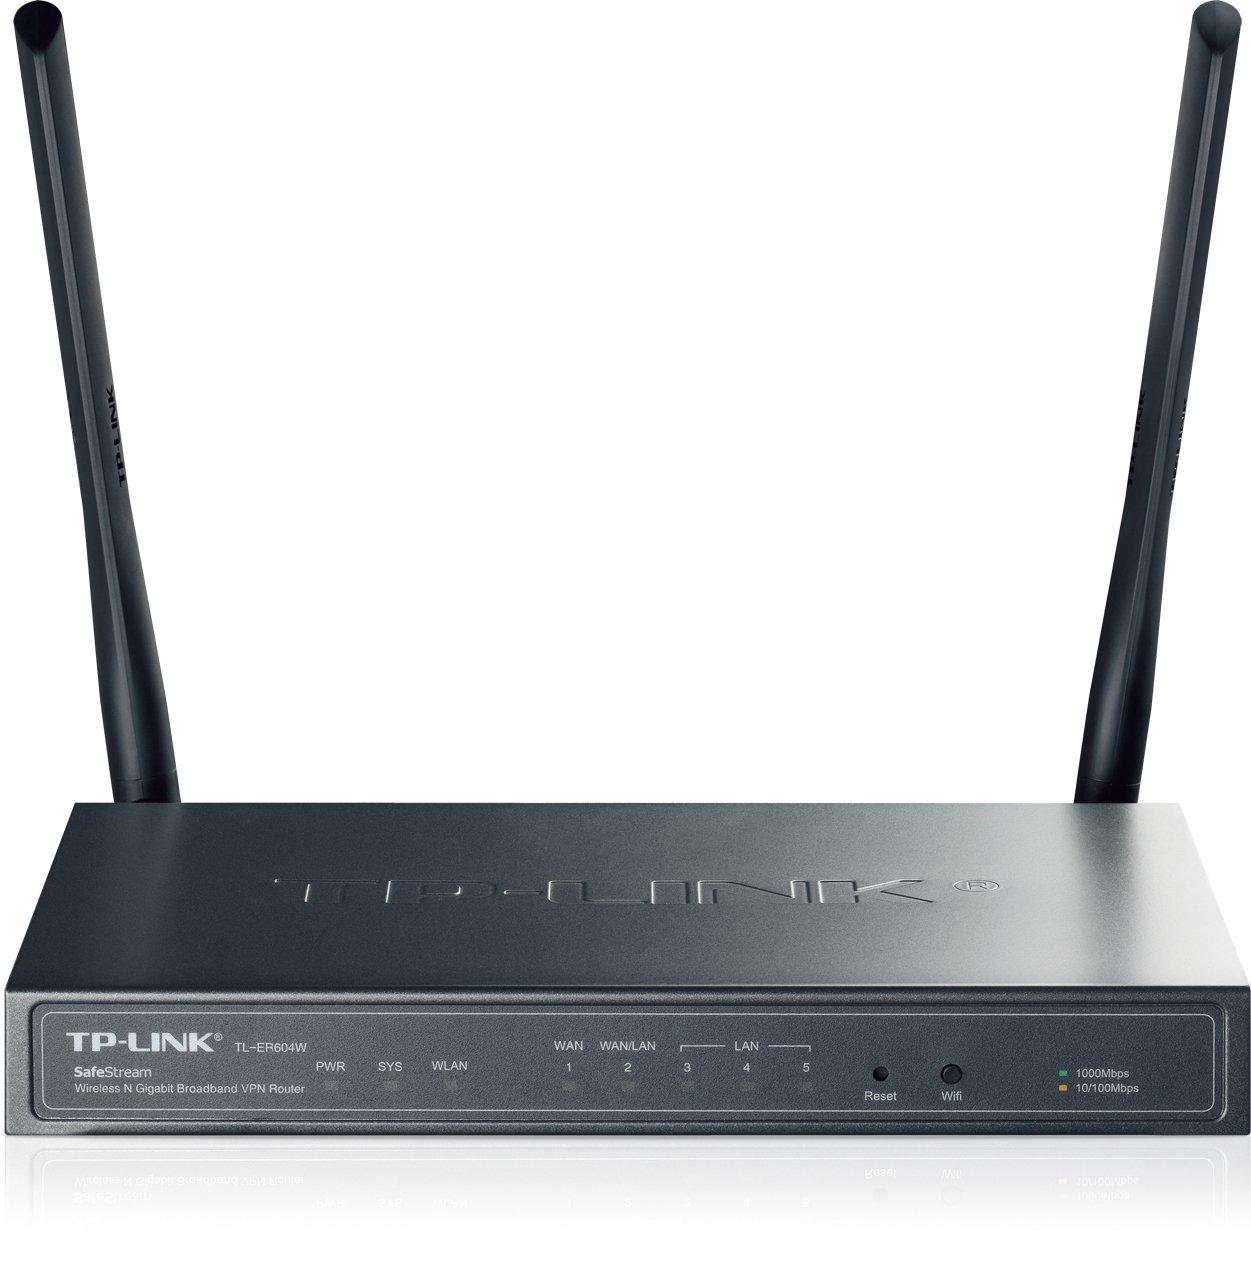 TP-LINK TL-ER604W SafeStream Wireless N300 Gigabit Broadband VPN Router, Load Balance, IPsec/PPTP/L2TP VPN, 300Mbps Wireless N Speed